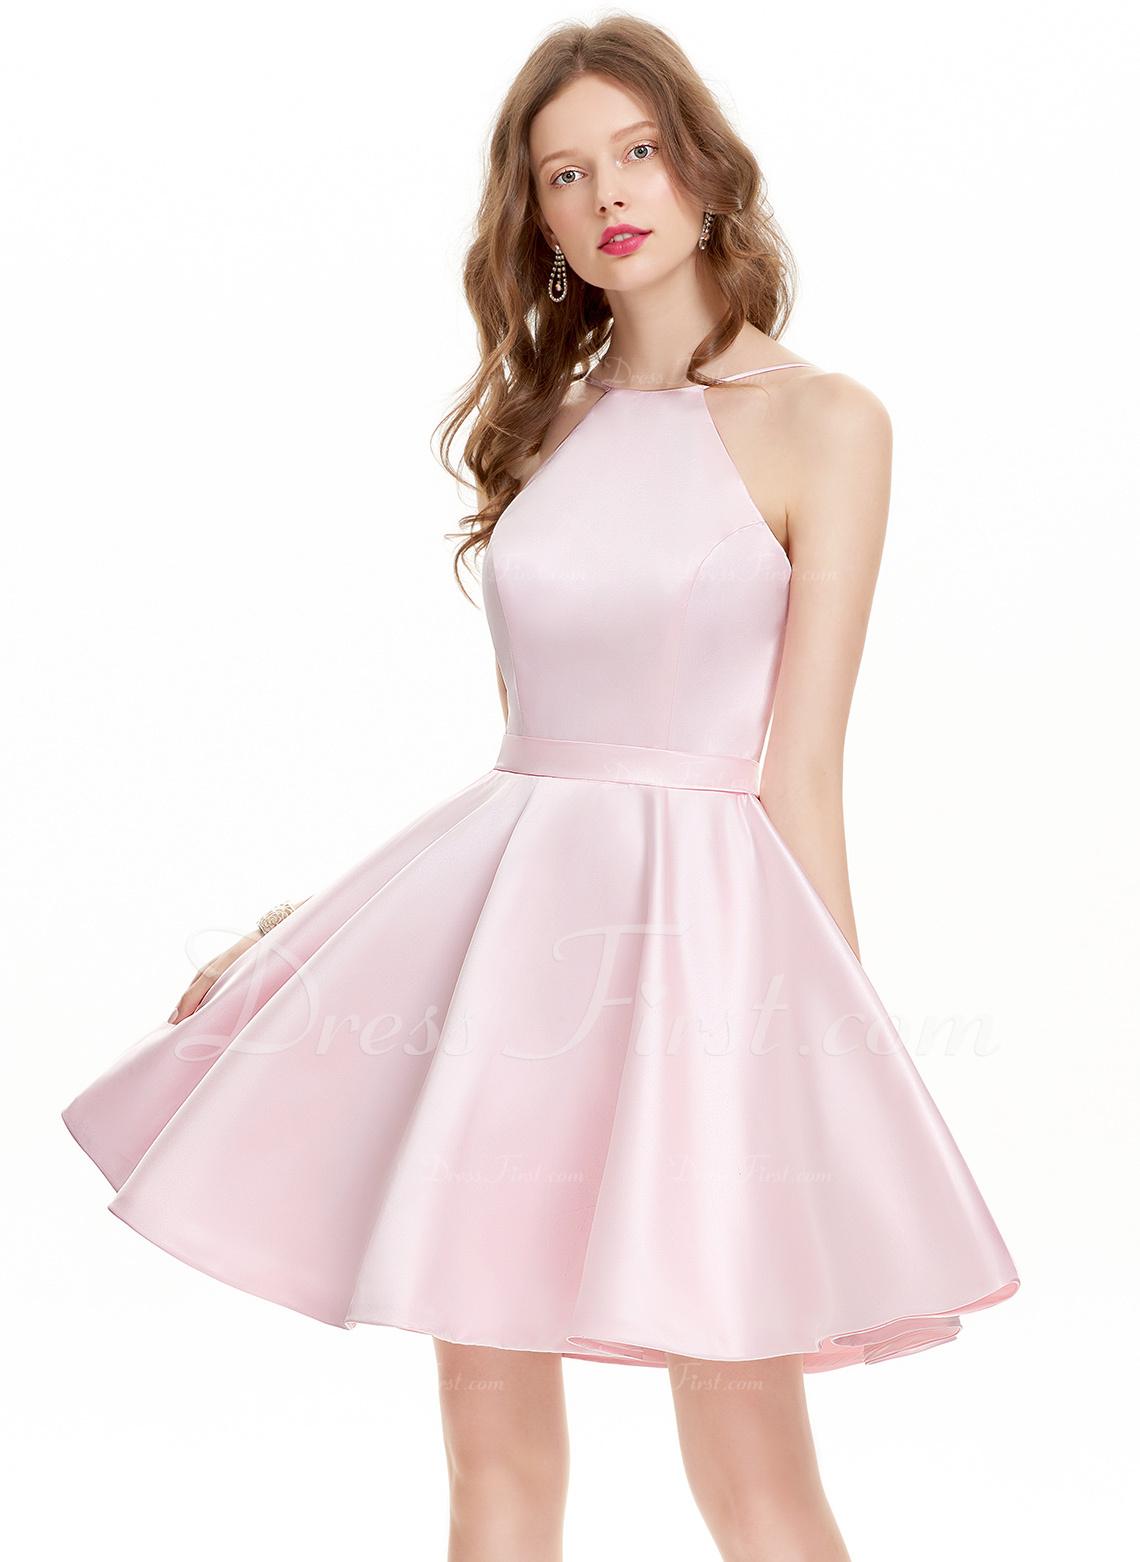 A-Line Scoop Neck Short/Mini Satin Homecoming Dress